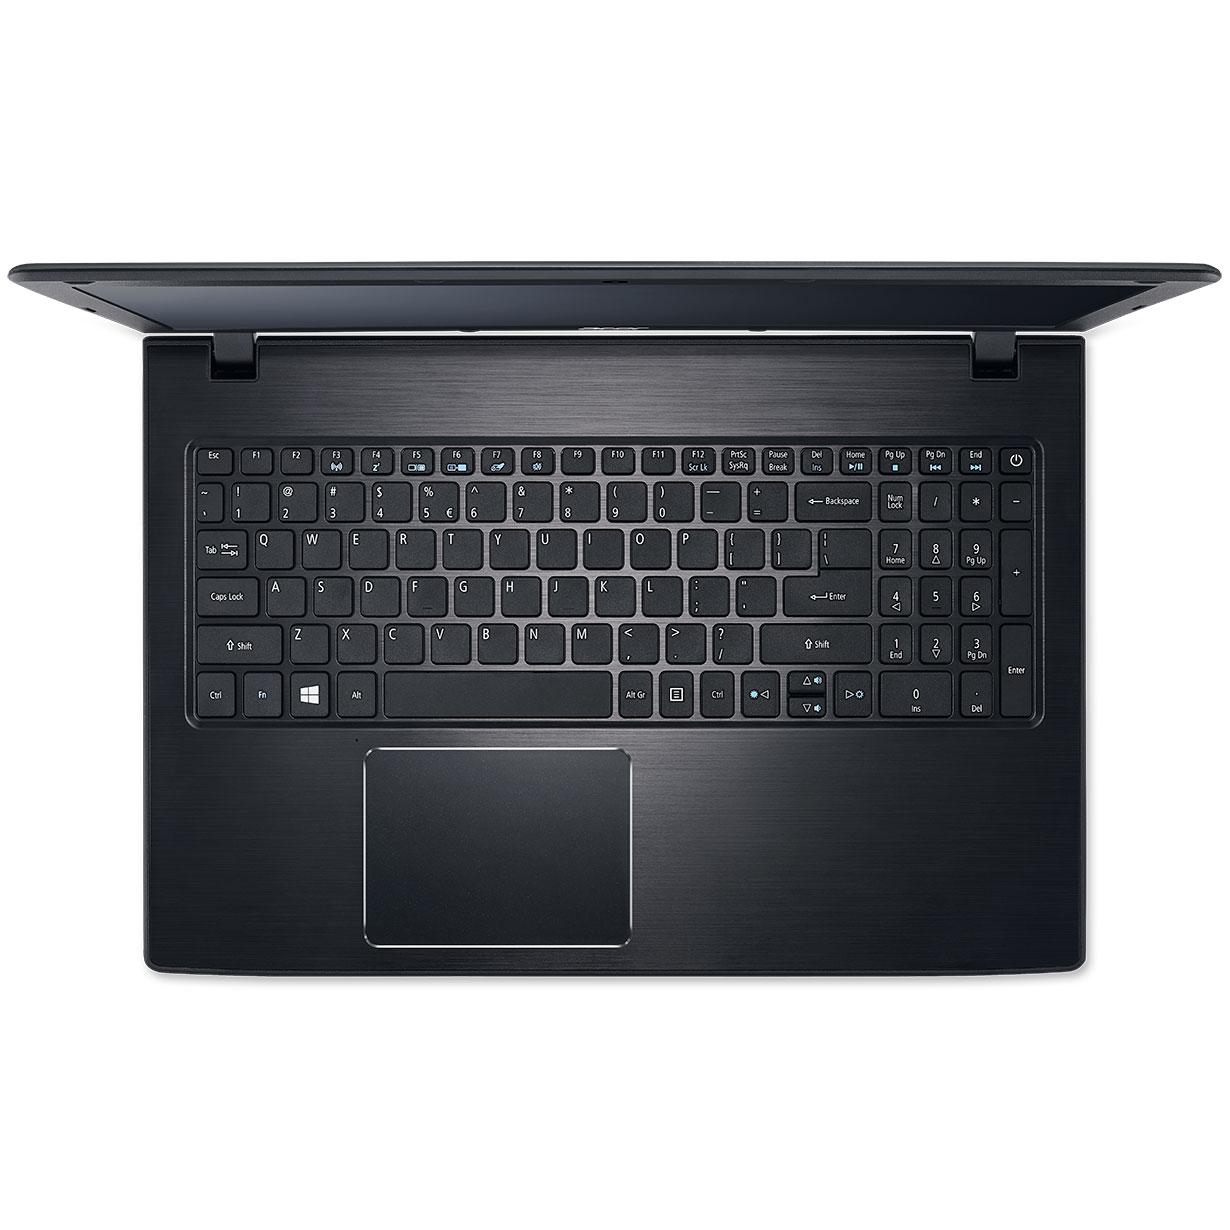 Acer NX.VDMEF.012 - PC portable Acer - Cybertek.fr - 2